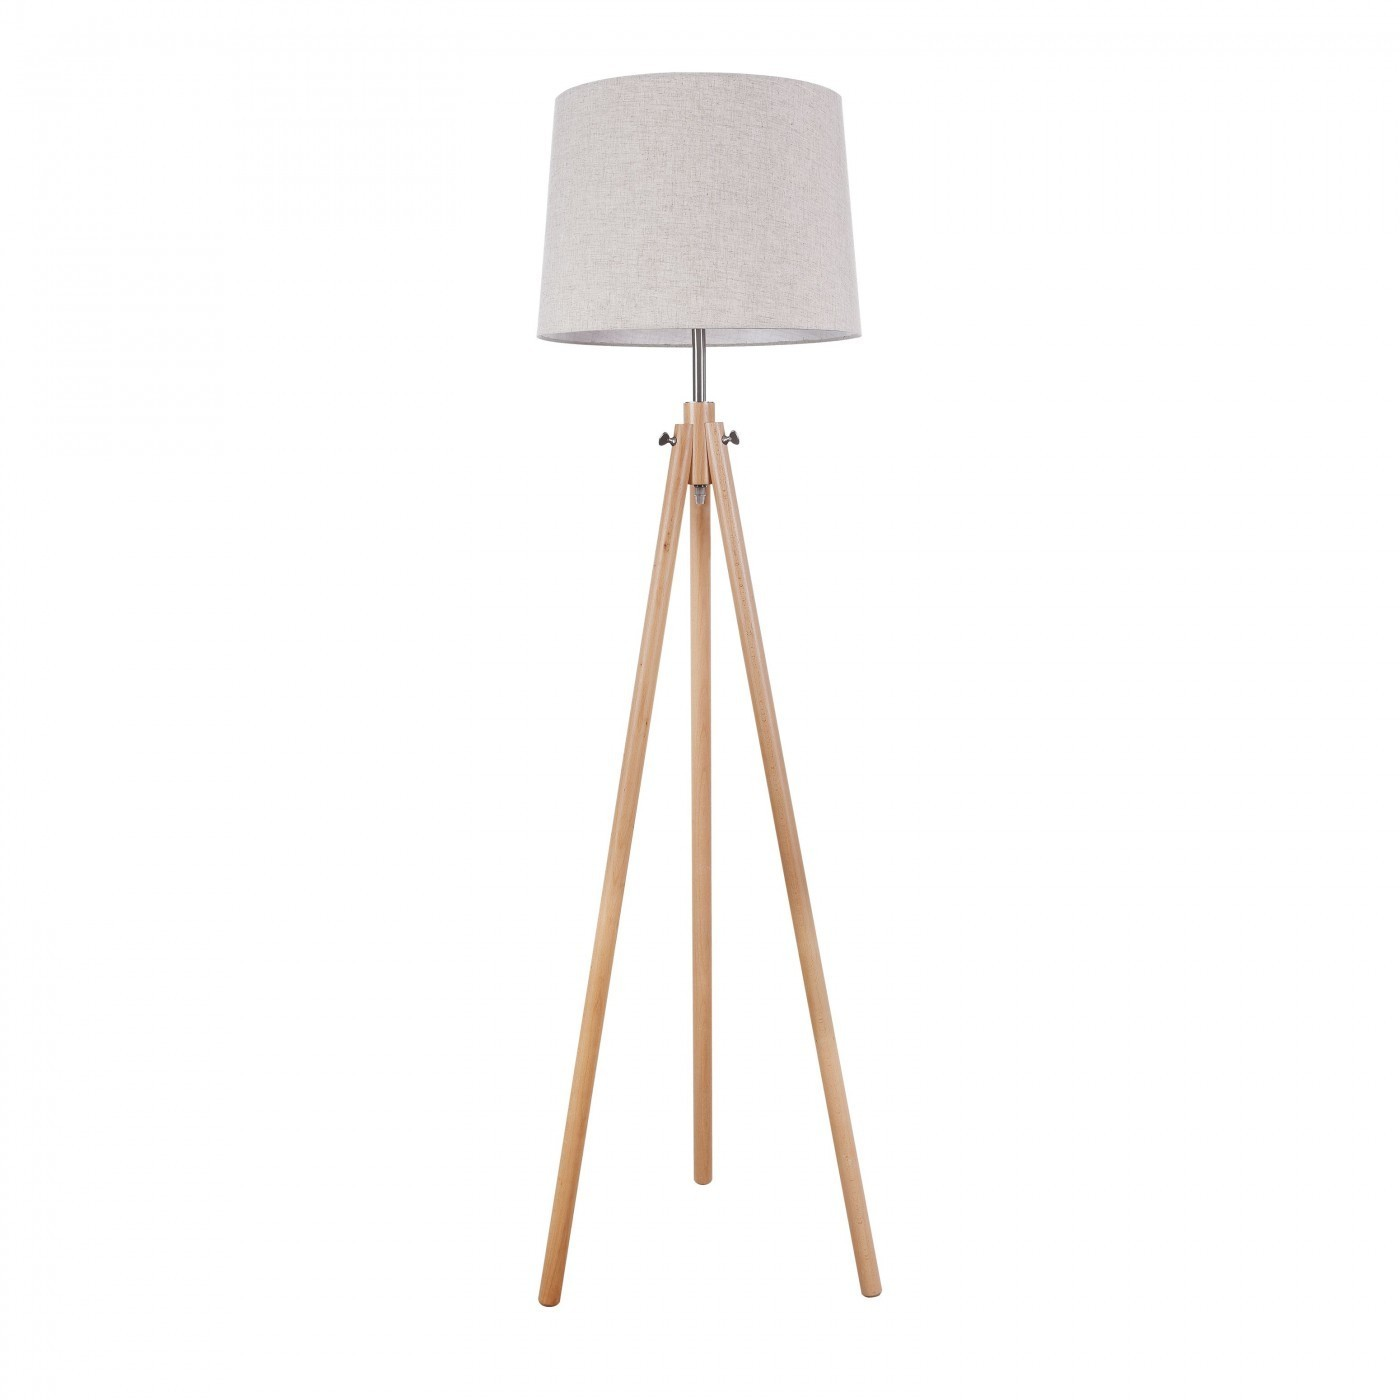 Calvin - Maytoni - lampa podłogowa nowoczesna